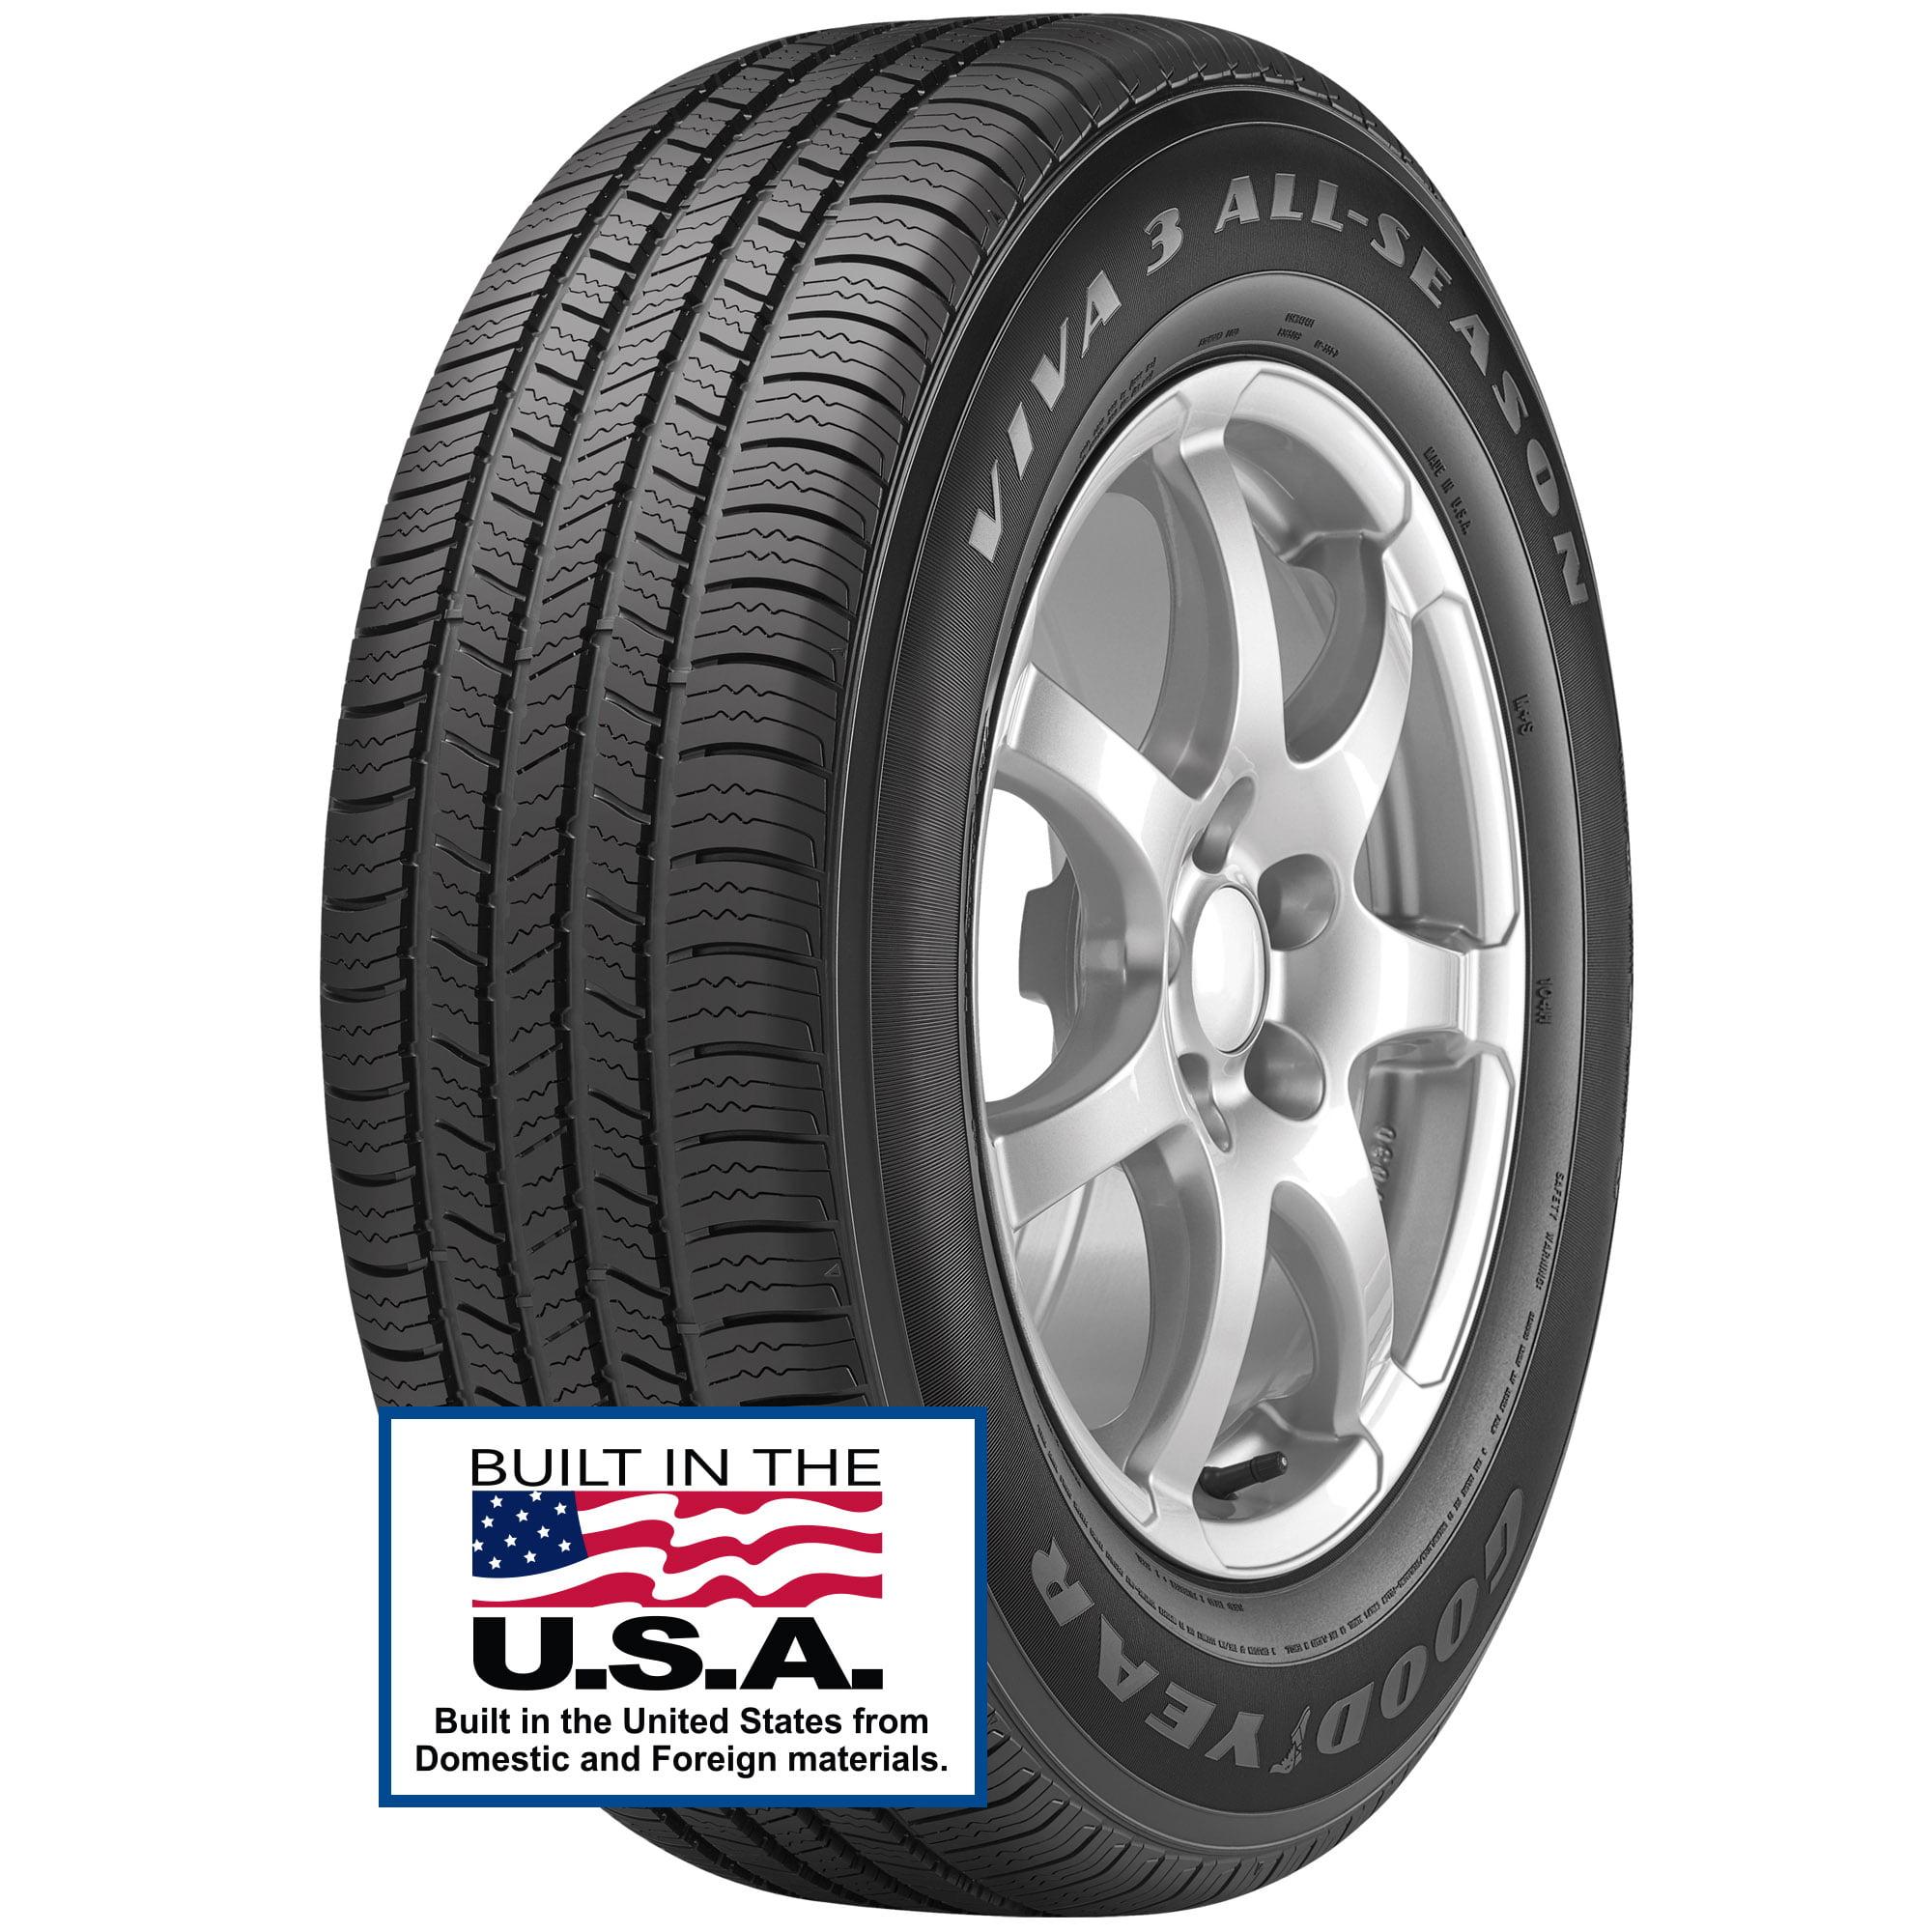 Goodyear Viva 3 All-Season Tire 225/60R17 99H